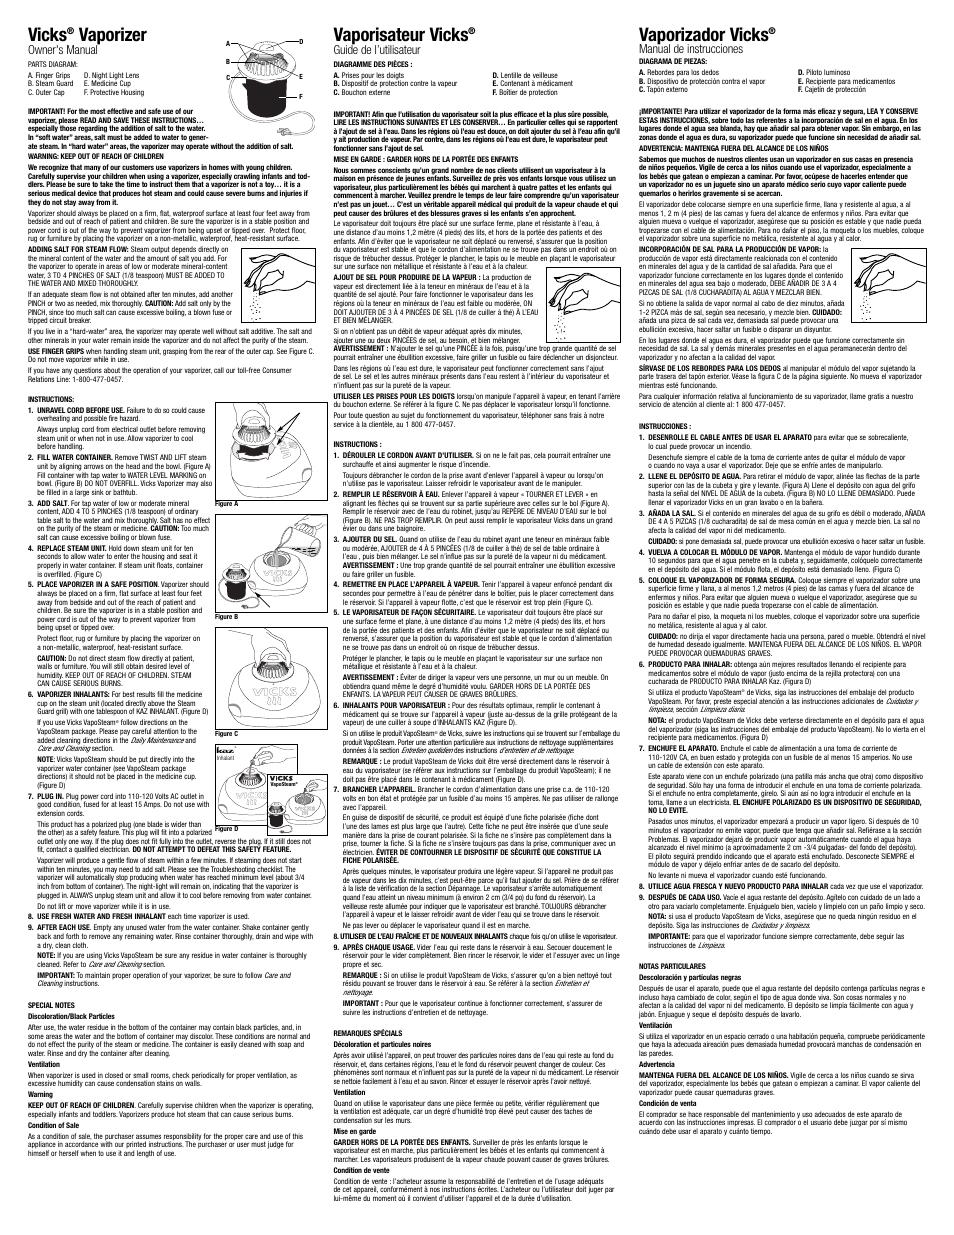 Vicks Warm Steam Vaporizer V105SG User Manual   2 pages   Original mode    Also for: 1.5 Gallon Vaporizer V150SG